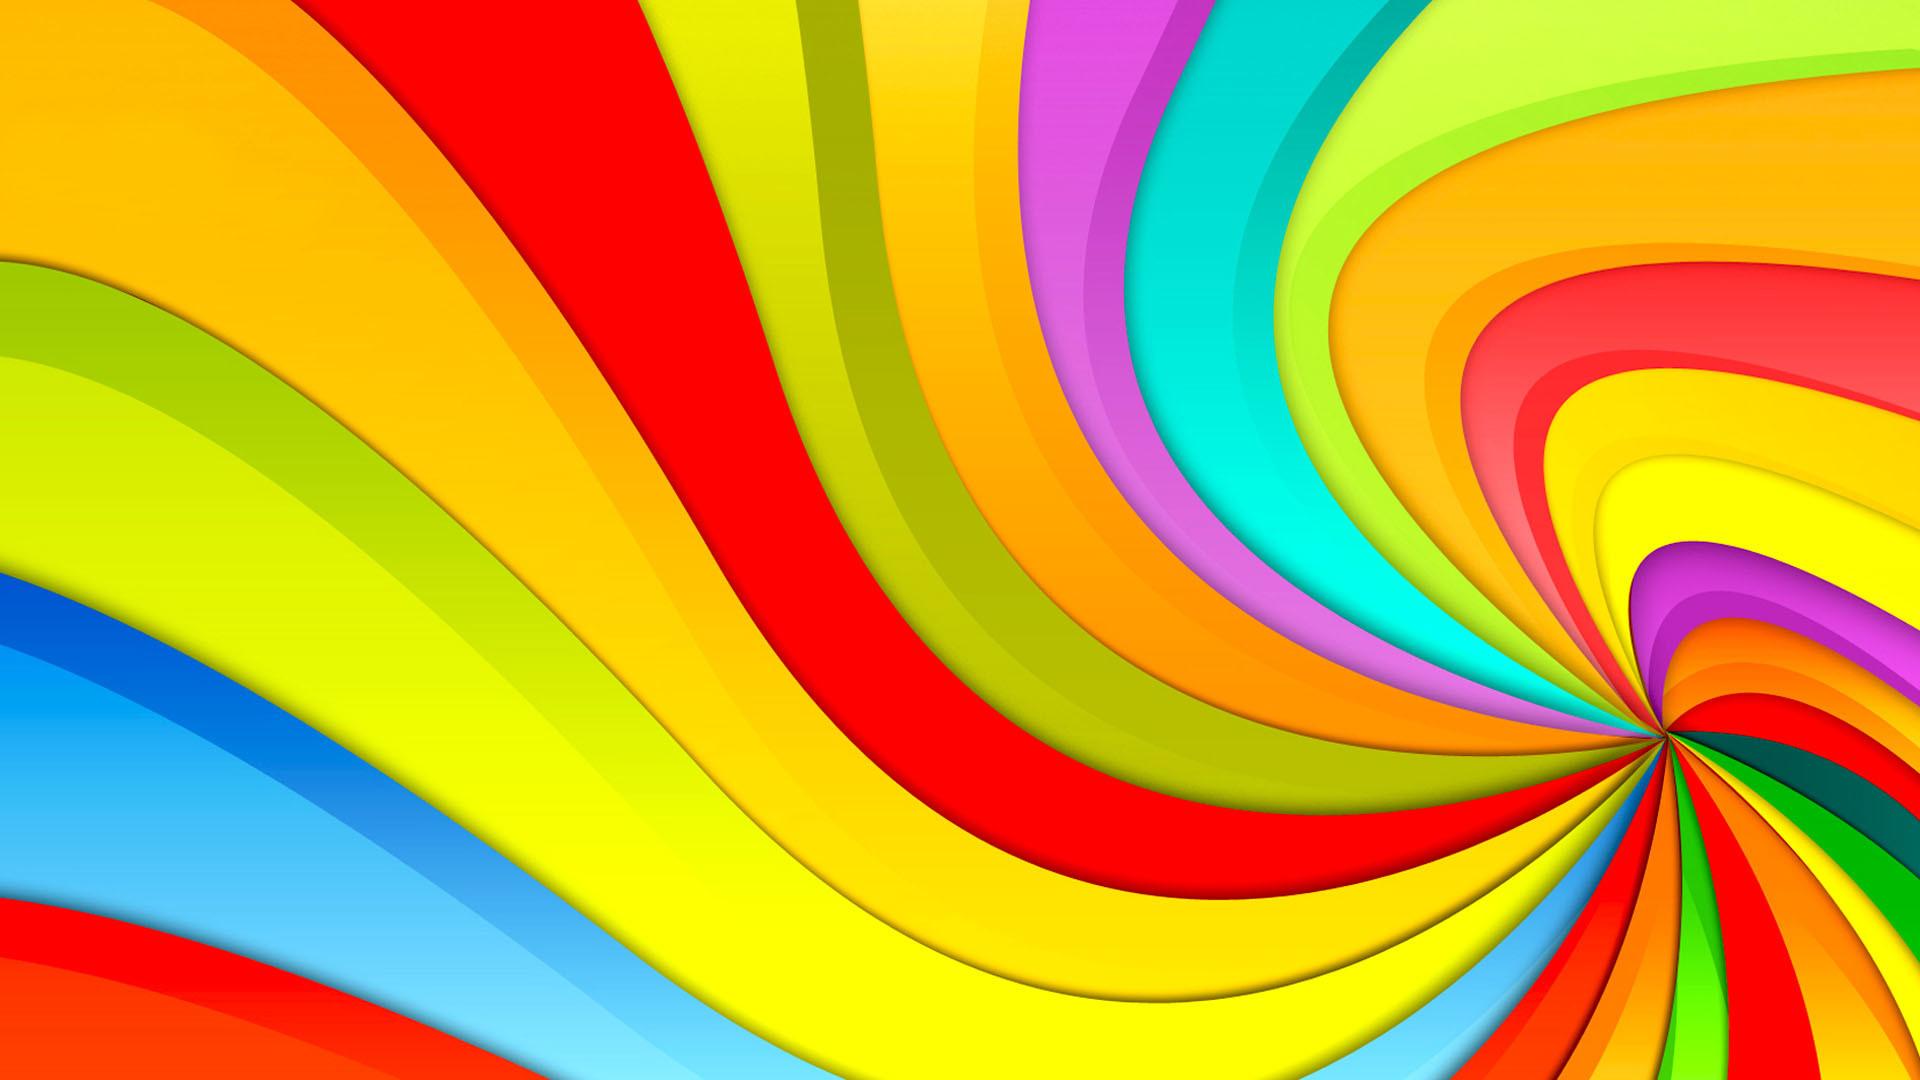 Colorful Desktop Backgrounds   Colorful For Desktop – HD Wallpapers